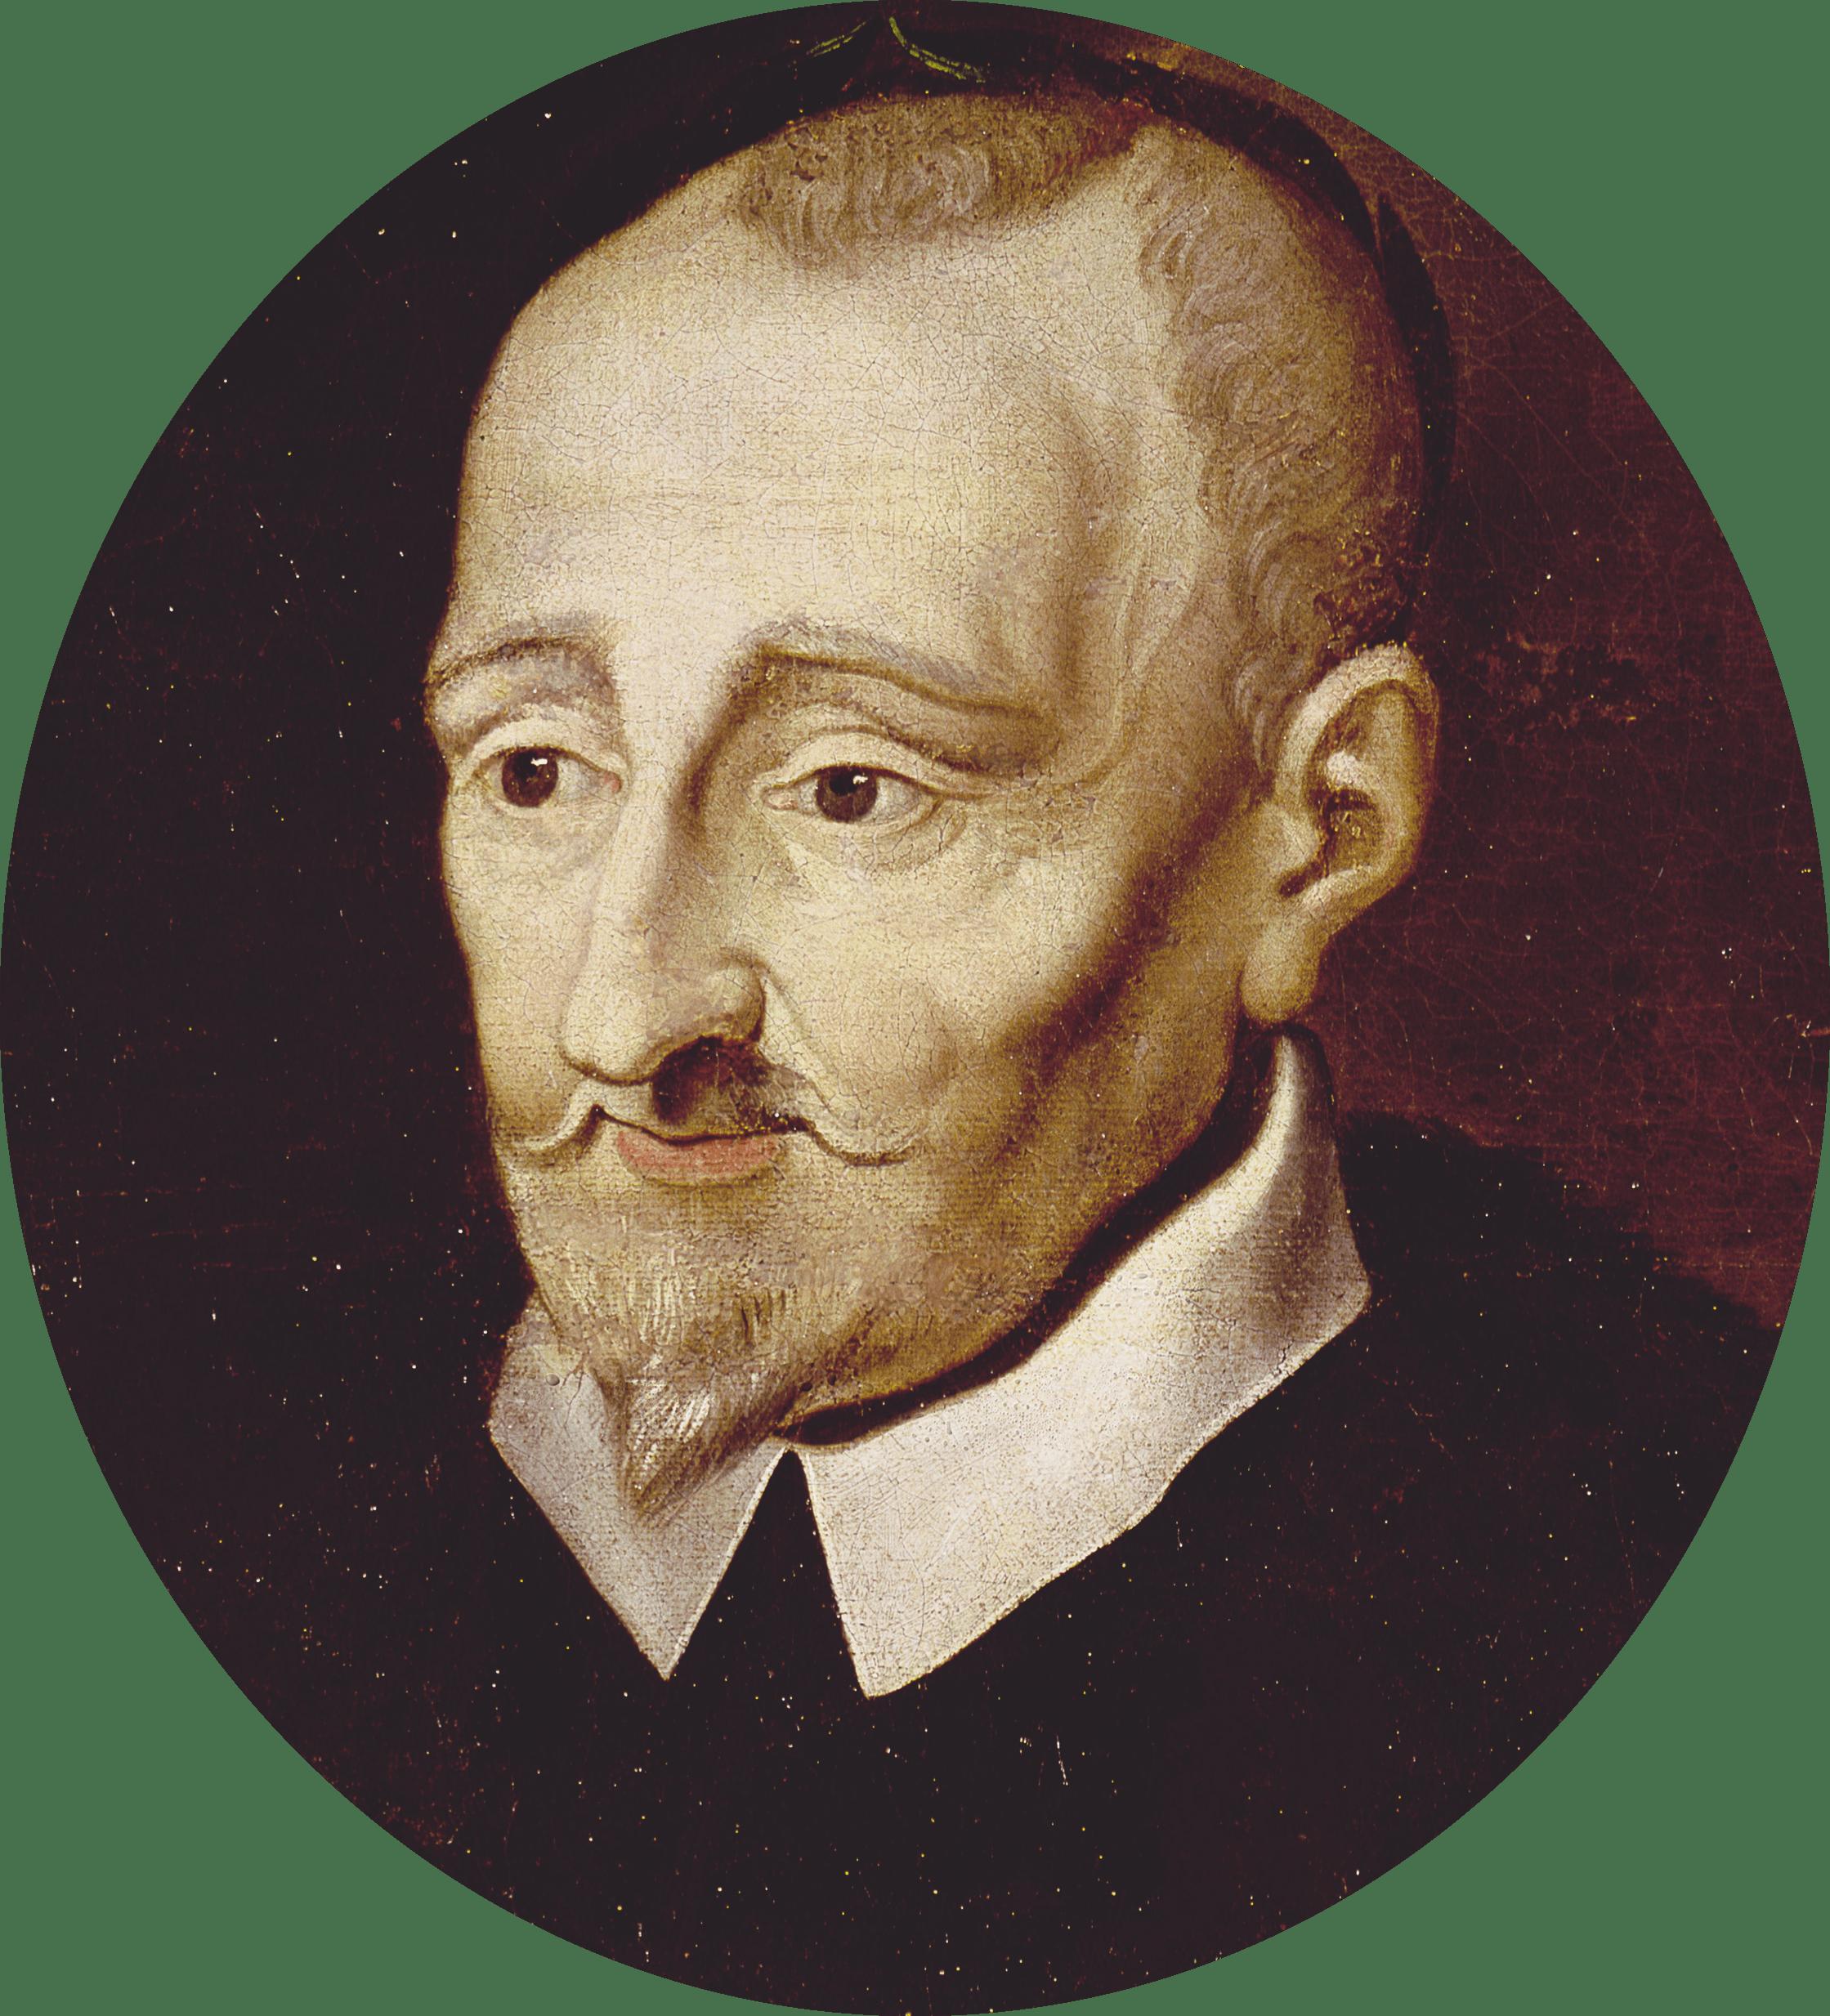 Tableau Pierre de Ronsard.